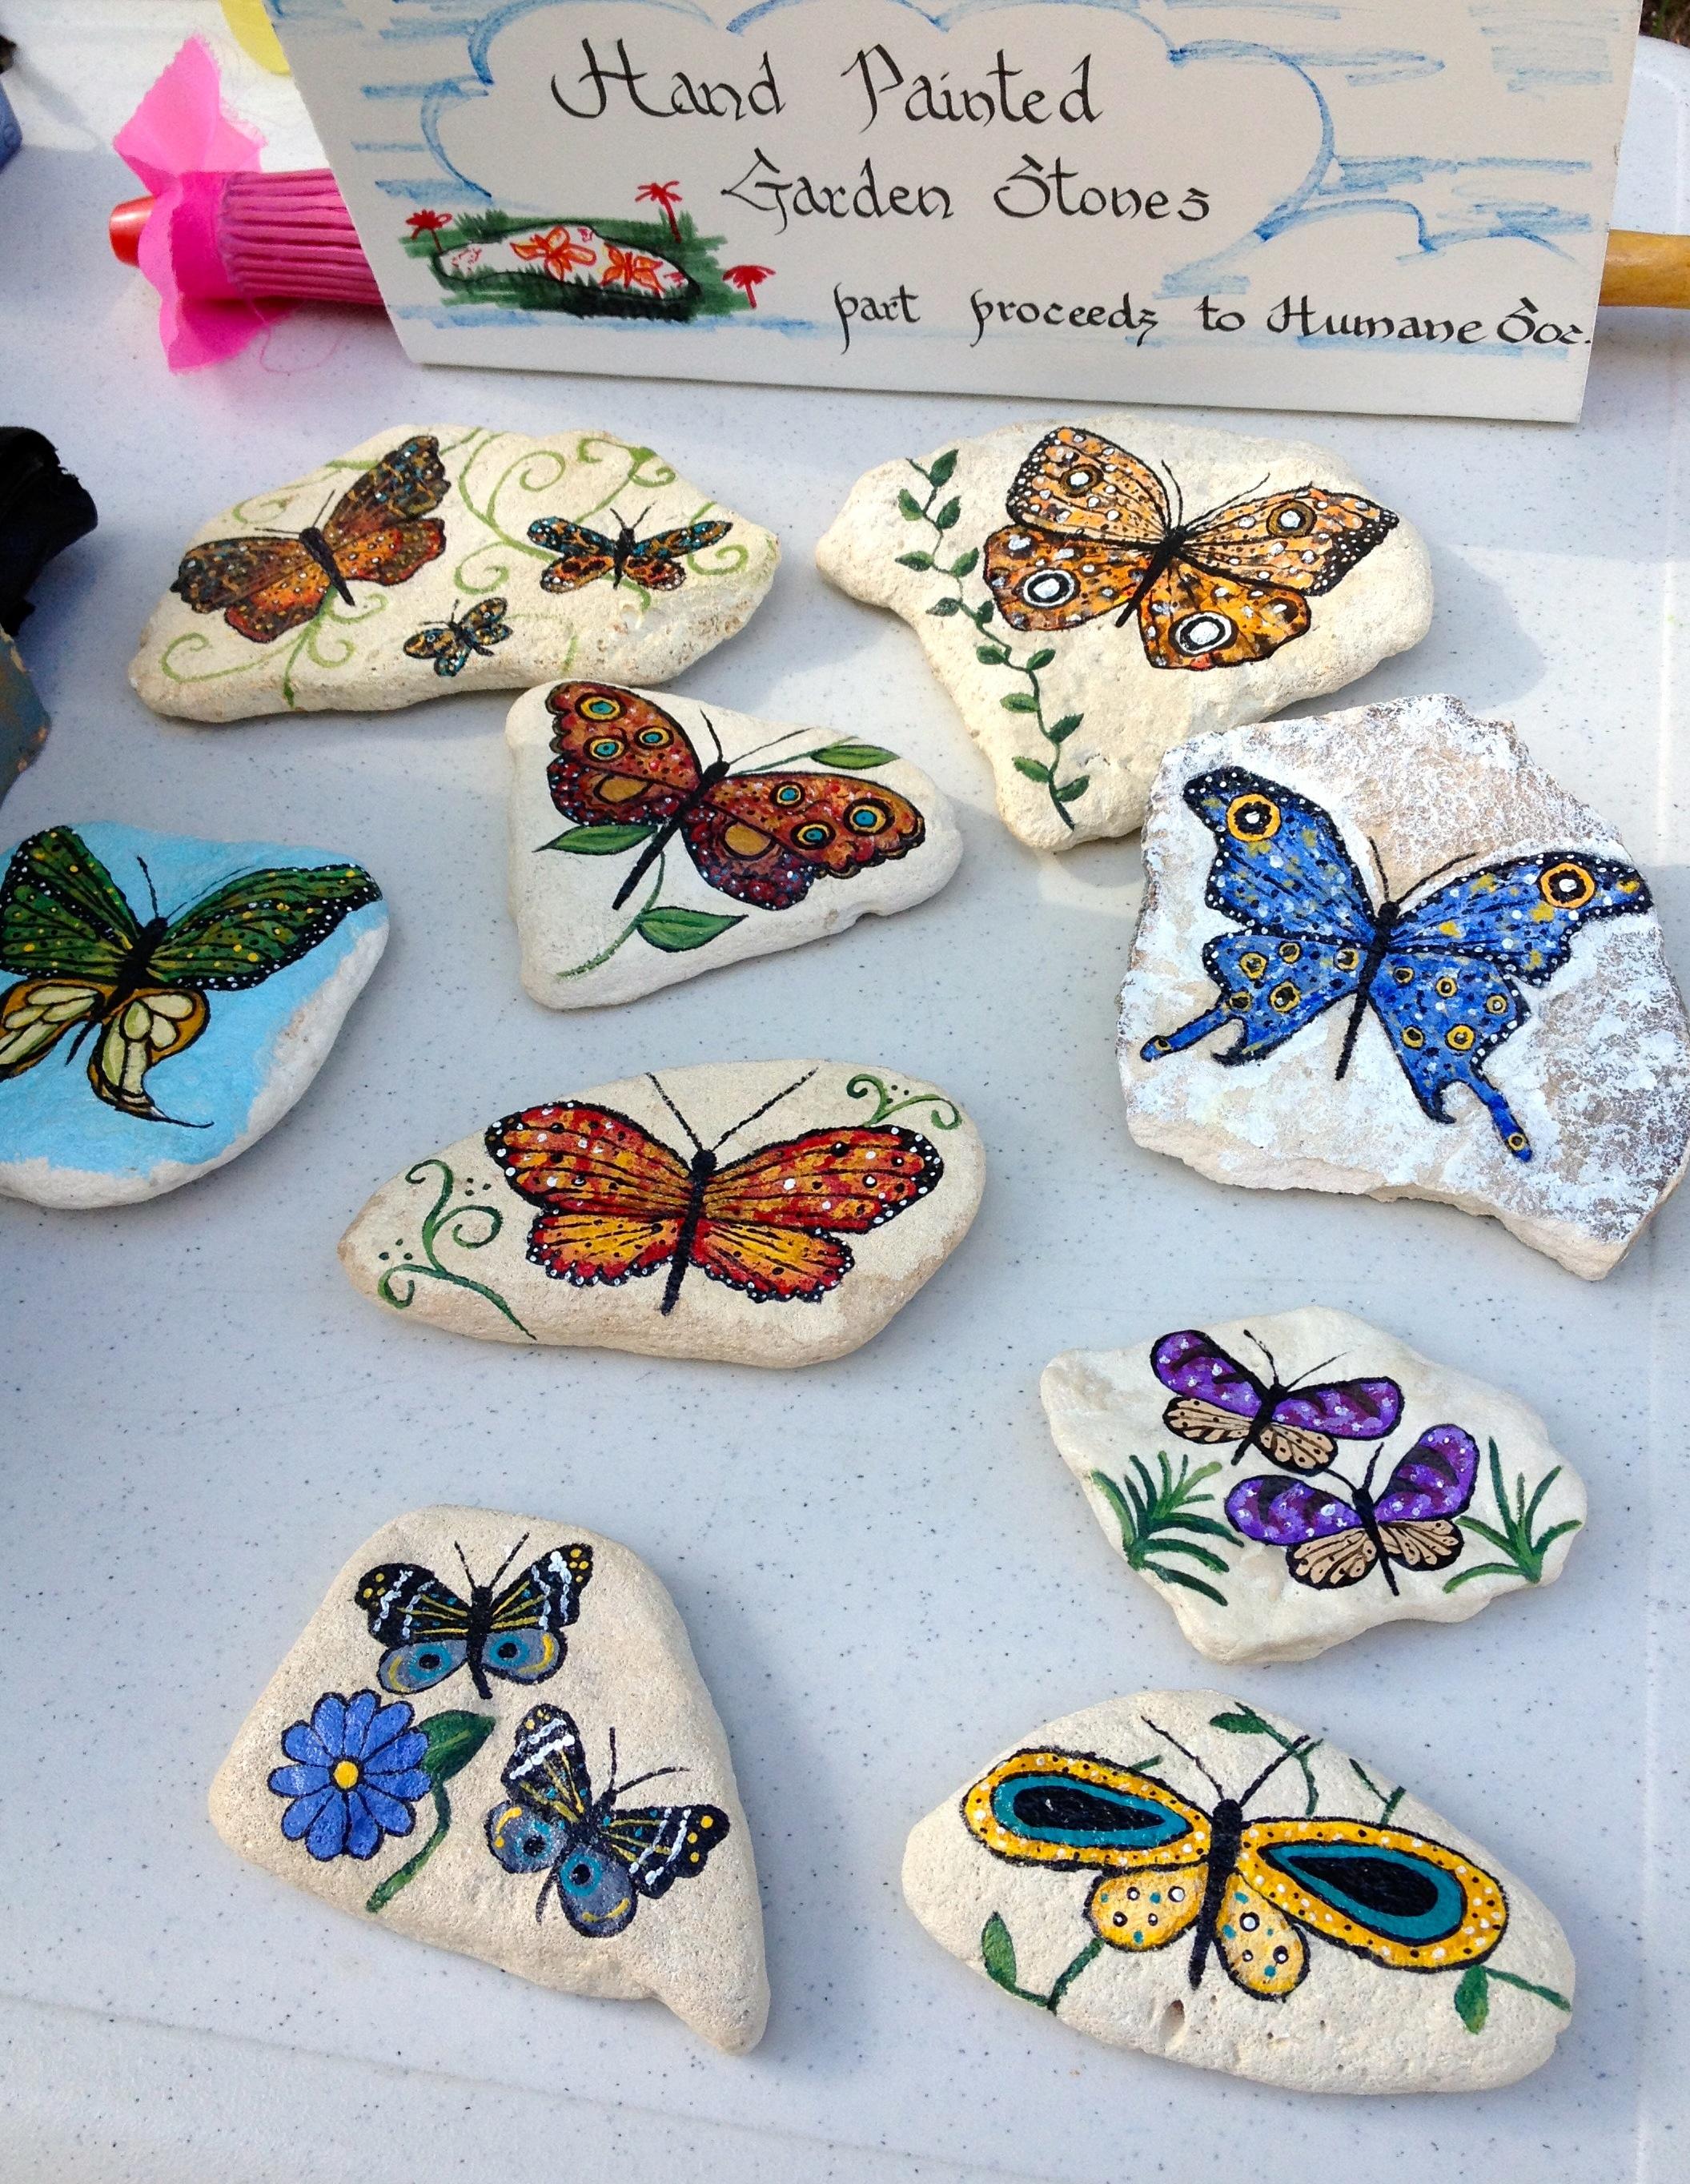 handpainted stones by artist Shanin Hughes